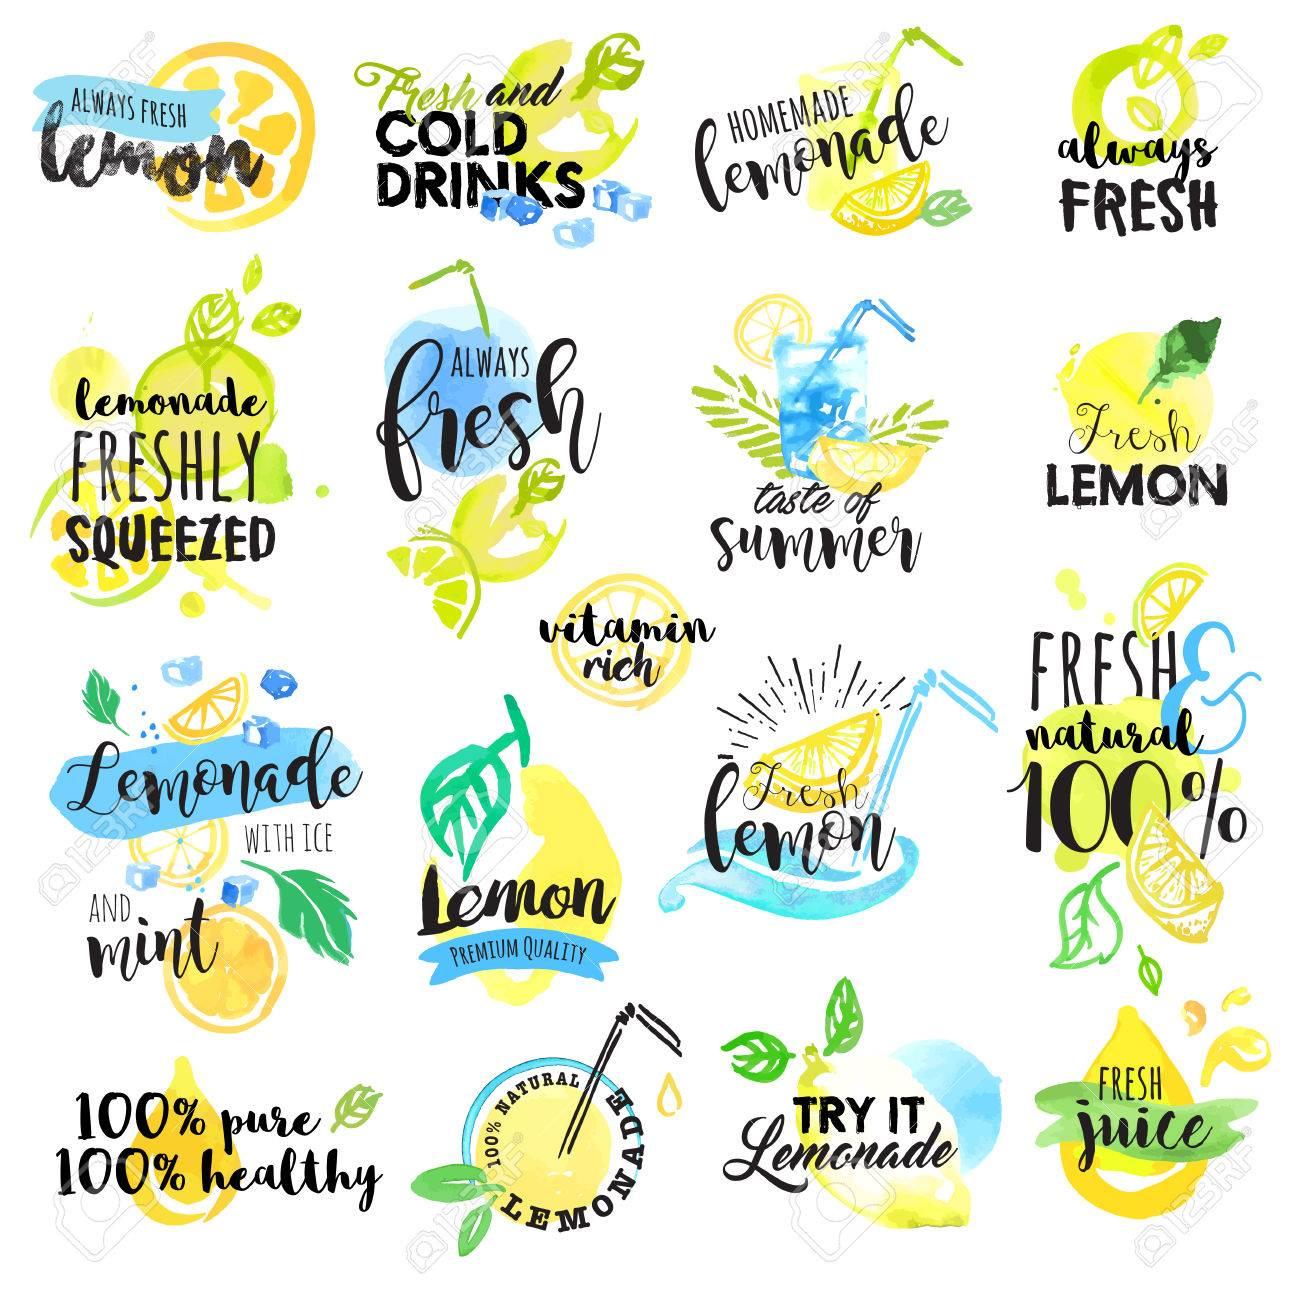 set of hand drawn watercolor labels and signs of lemon and lemonade